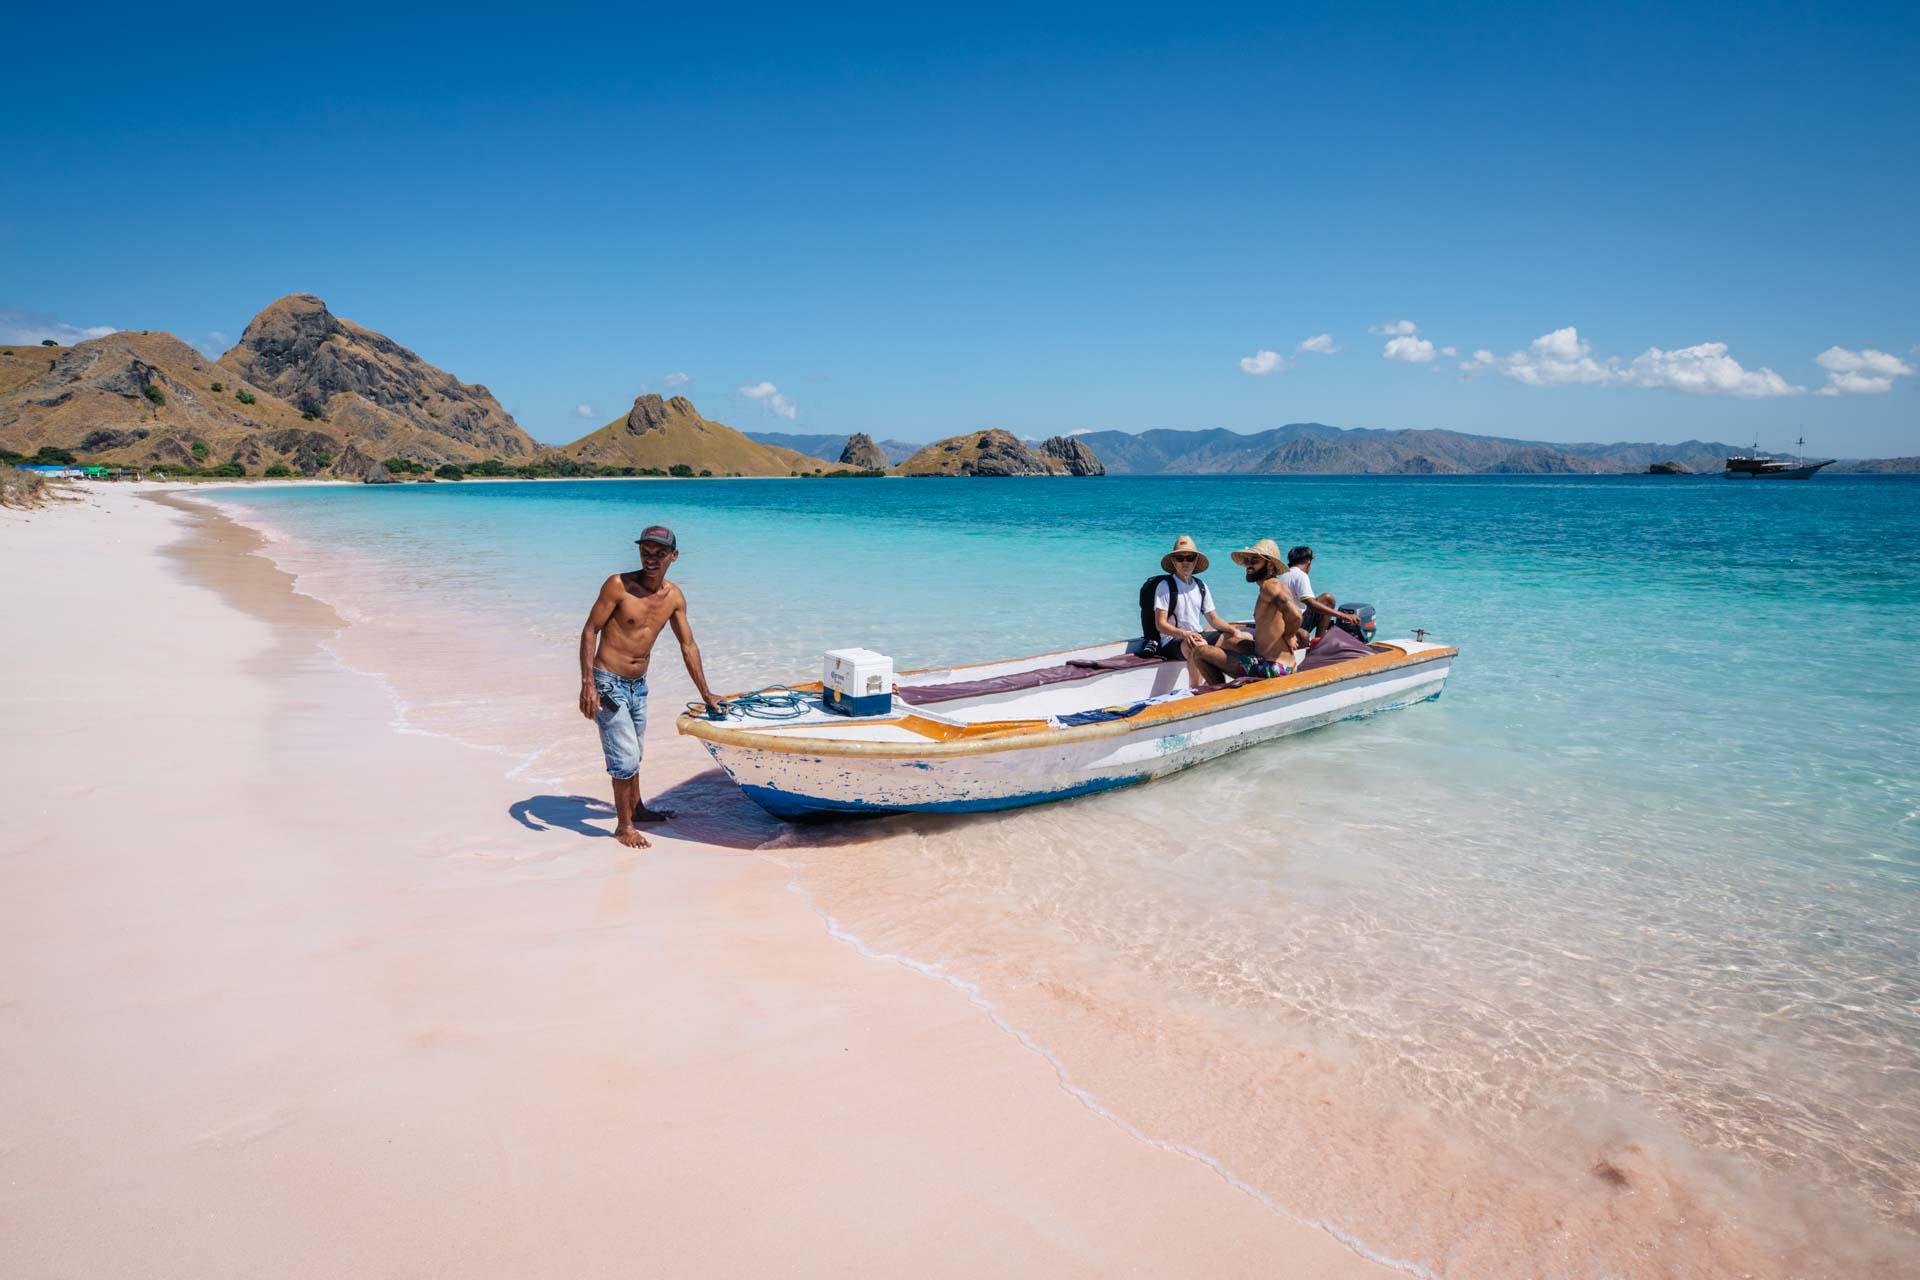 pink beach komodo, pink beach in indonsia, pink beach komodo island, komodo island pink beach, pink beach indonesia